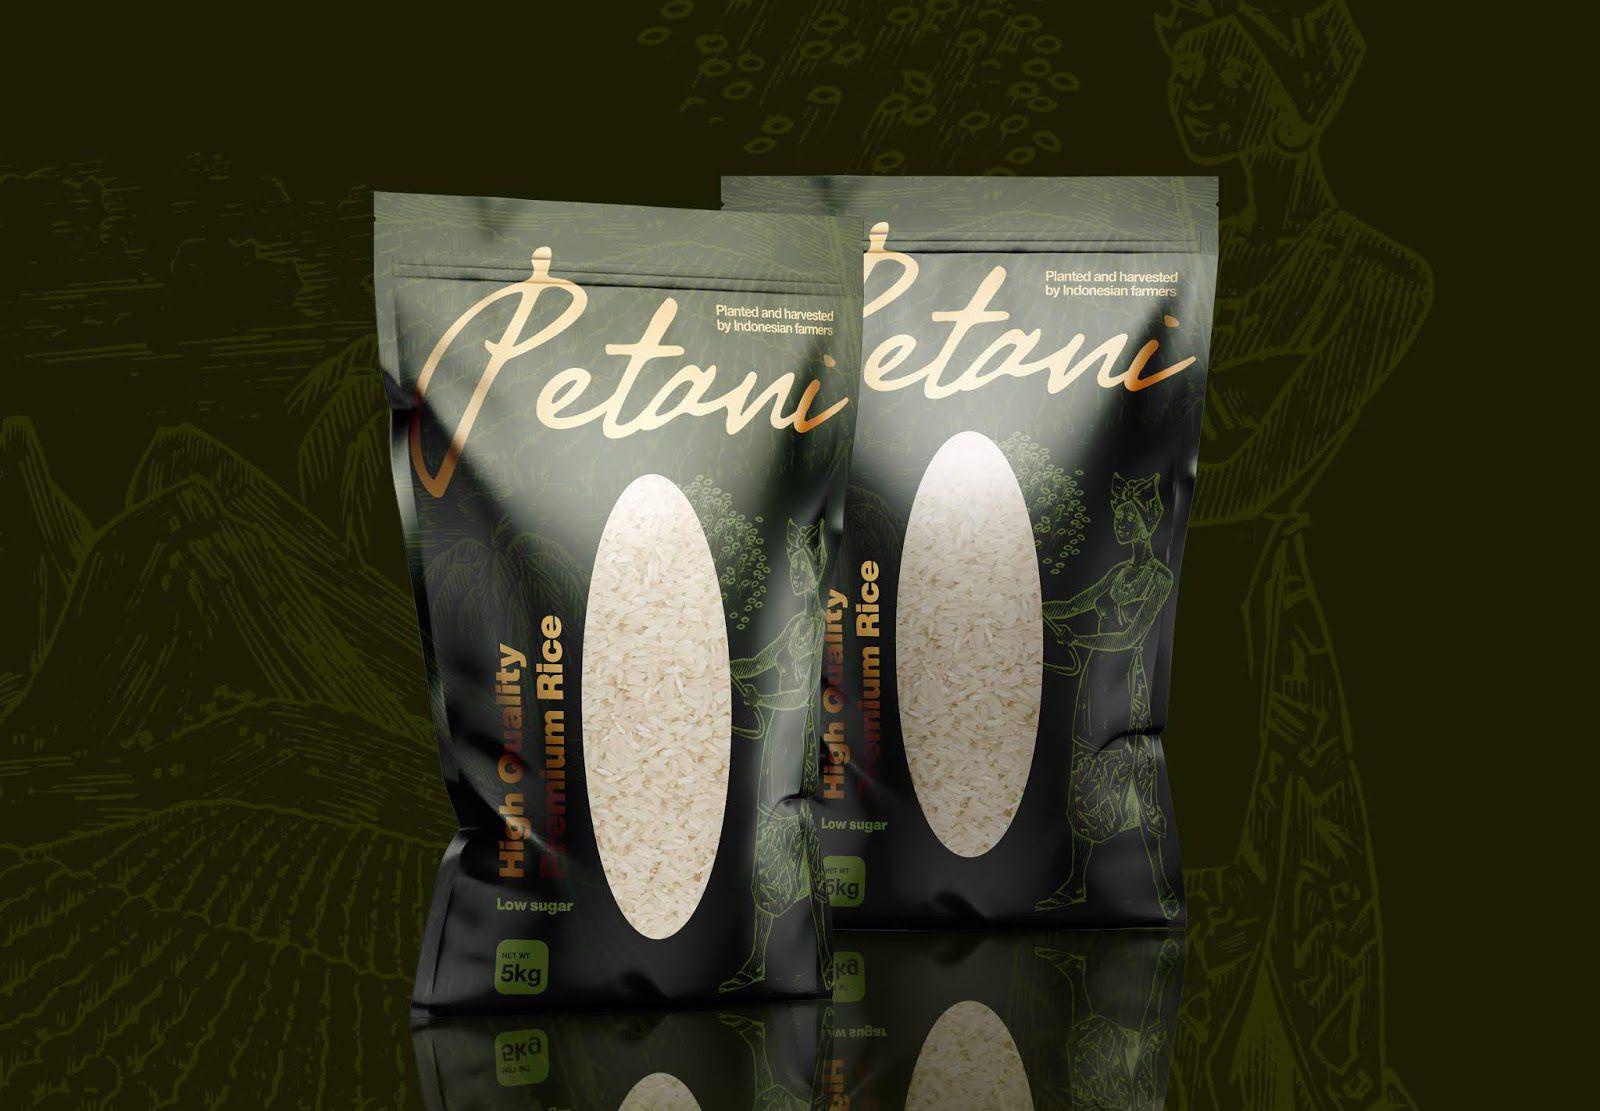 Petani (riz) I Design : Widarto Impact, Asie (décembre 2019)